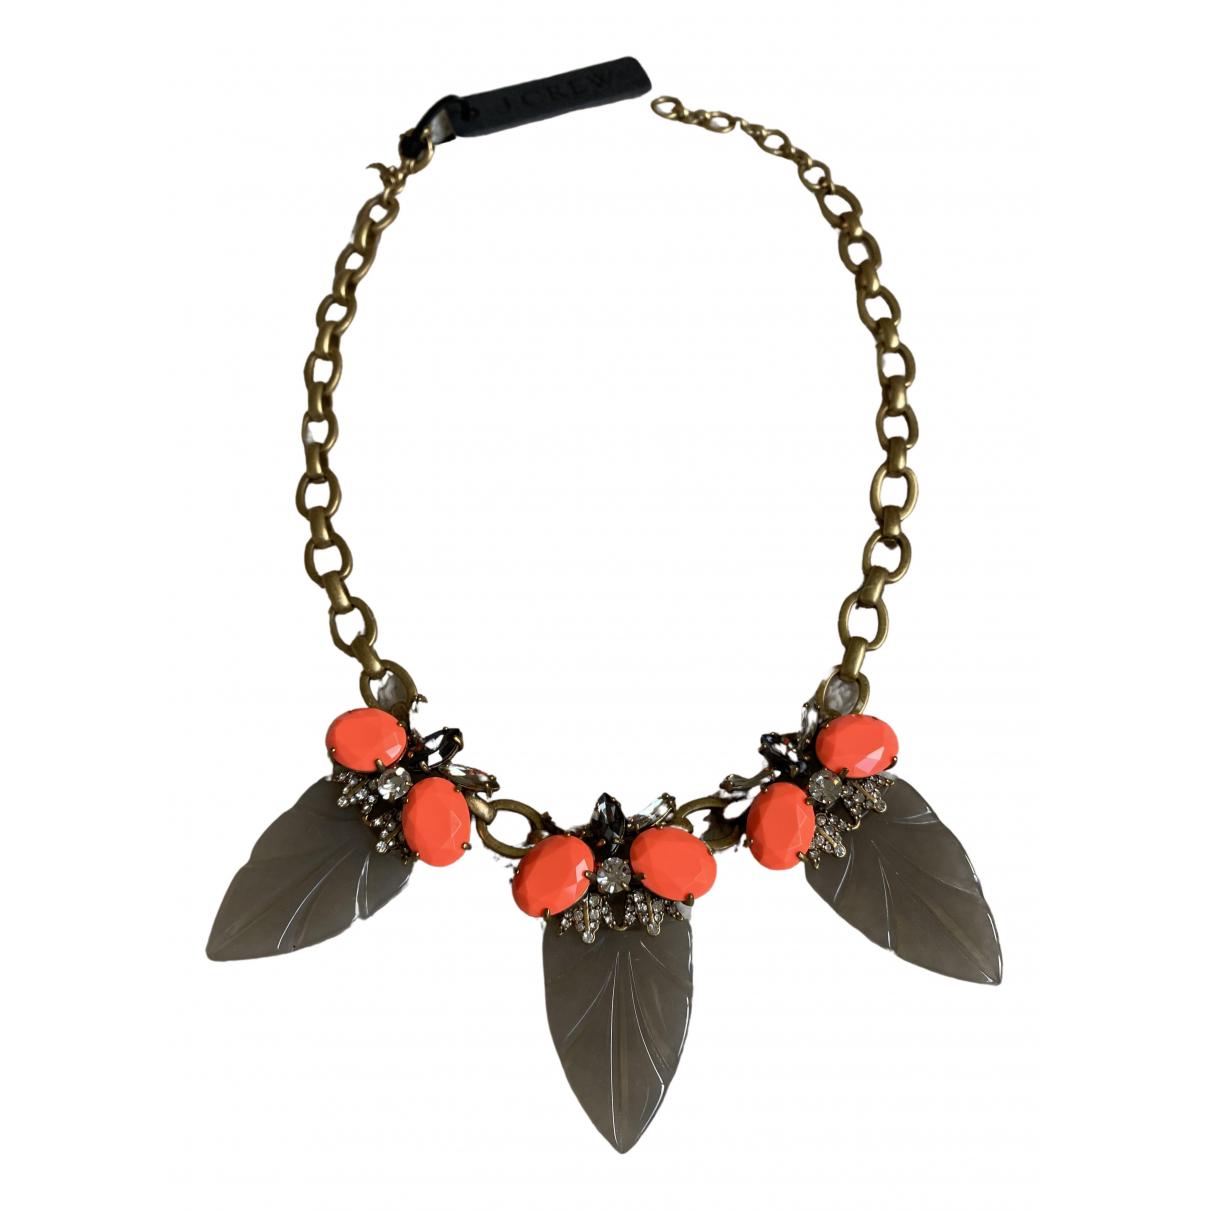 J.crew N Metal necklace for Women N